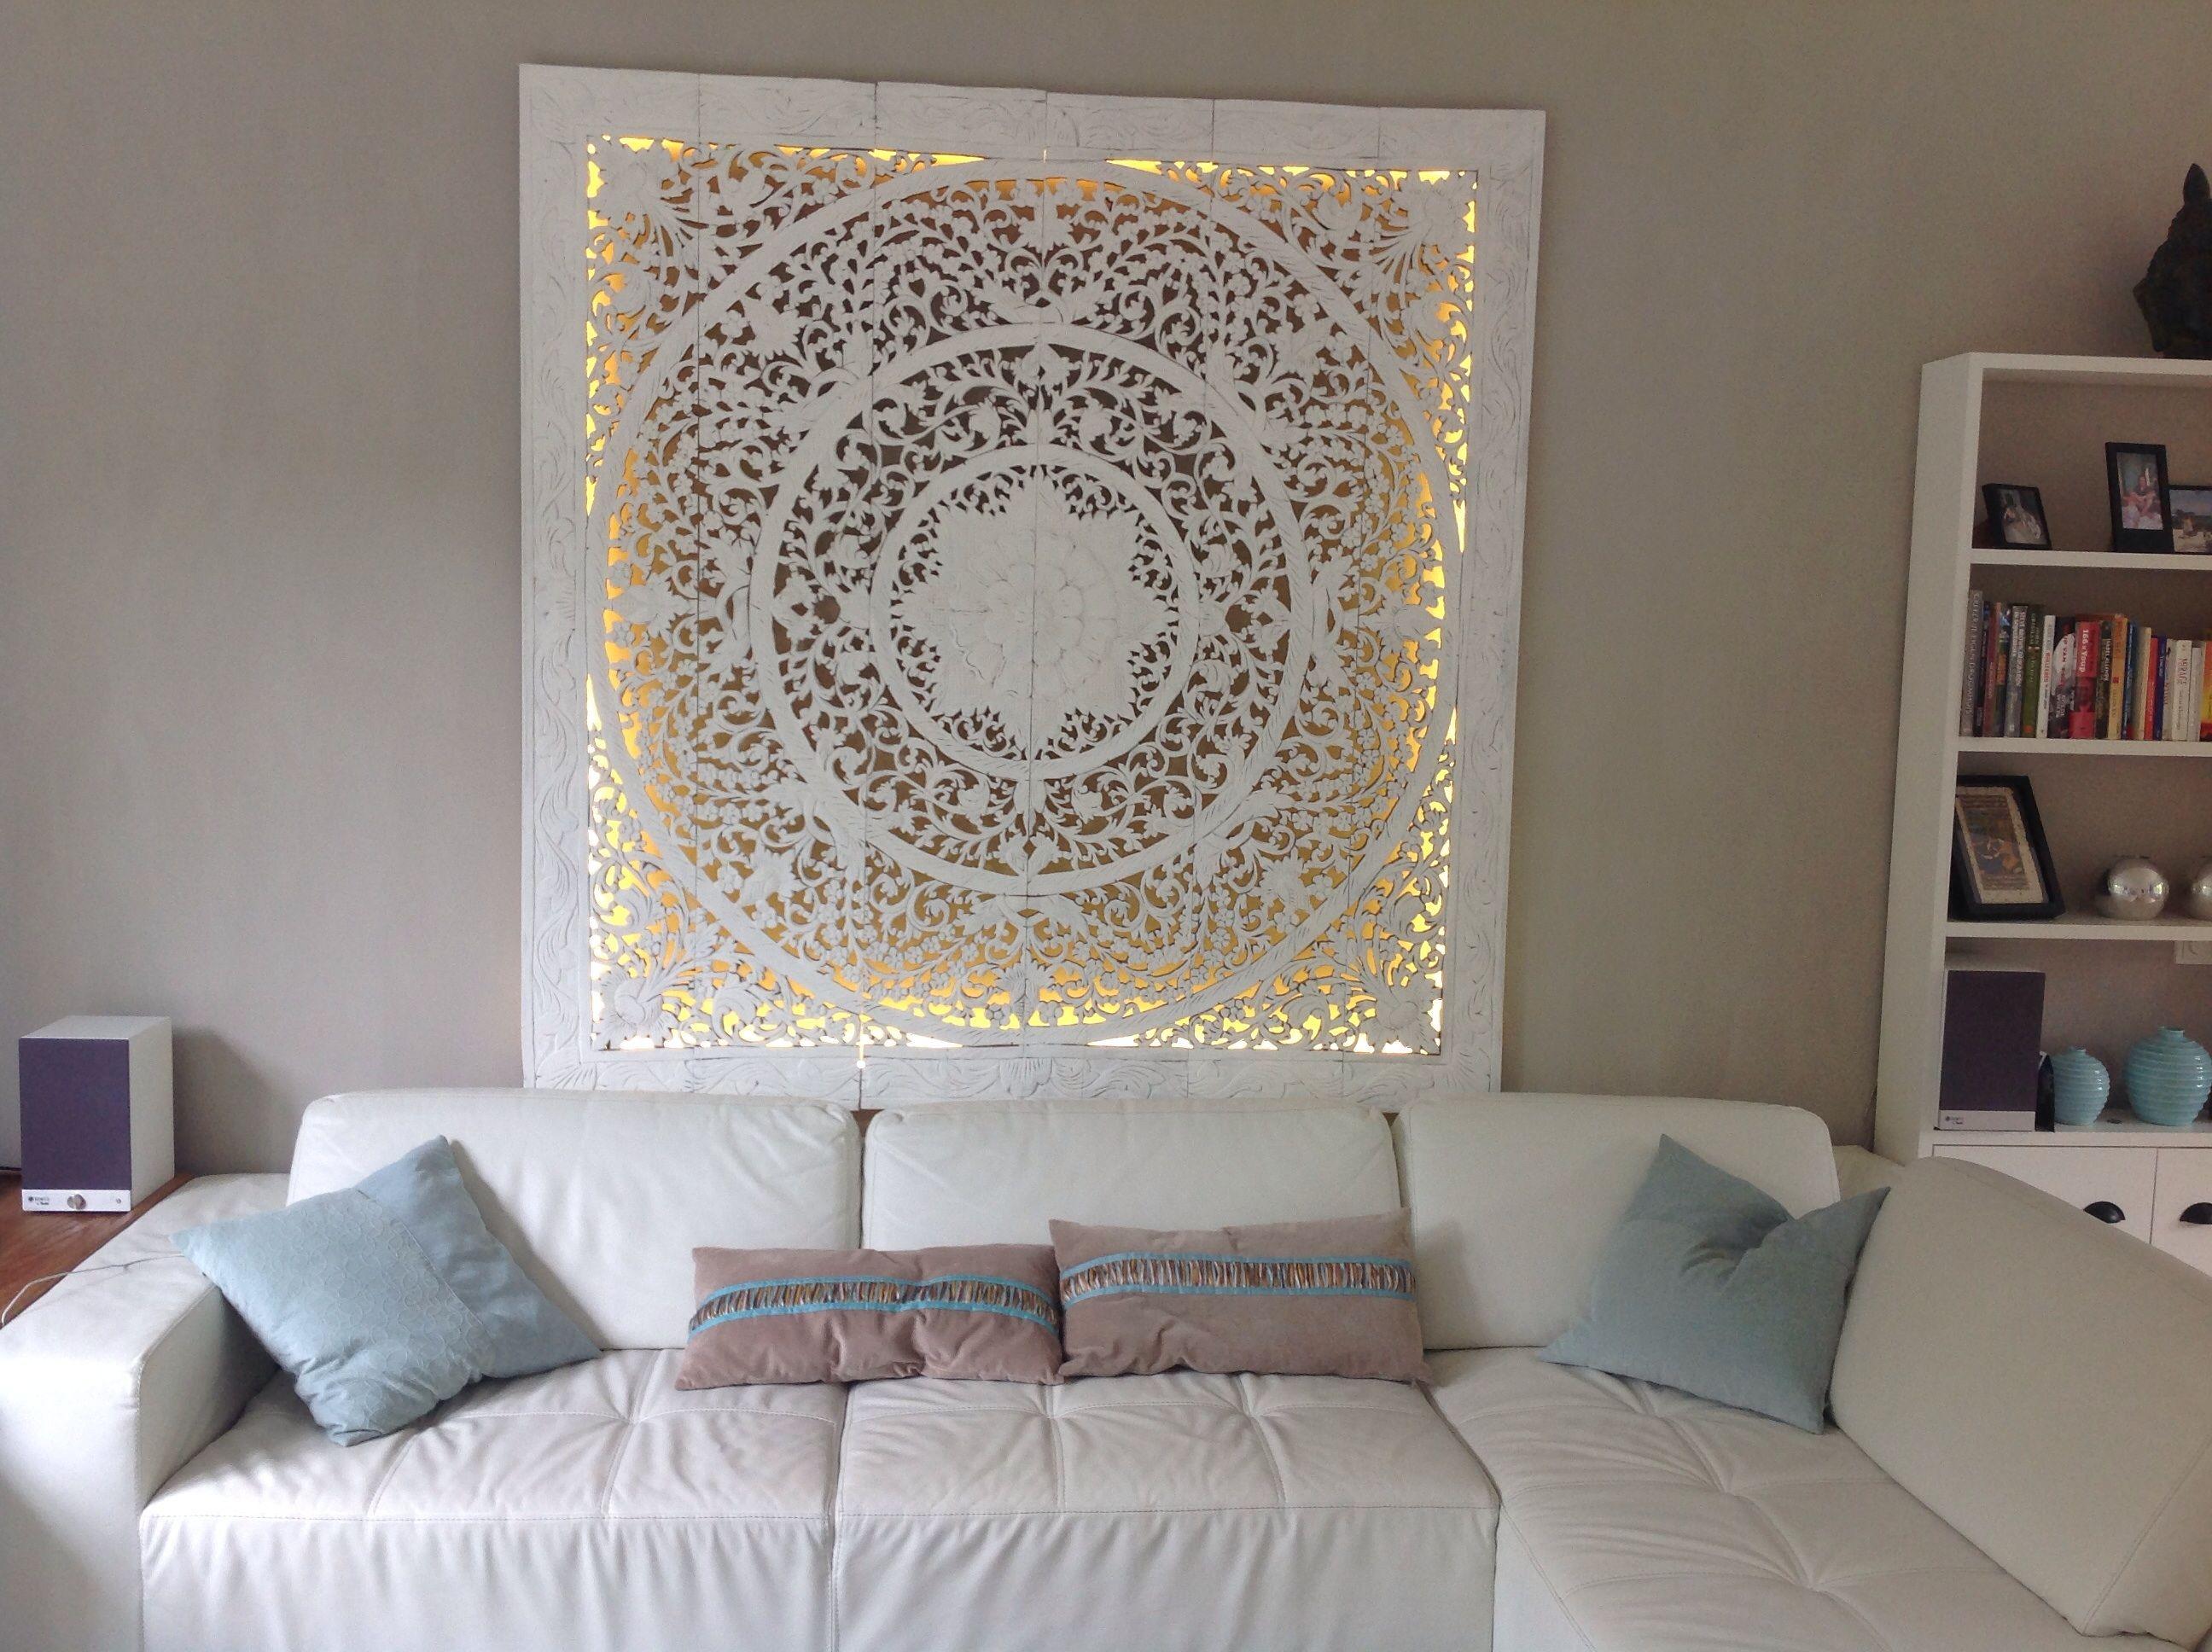 SIMPLY PURE Houtsnijwerk wandpaneel 180x180 cm wit in